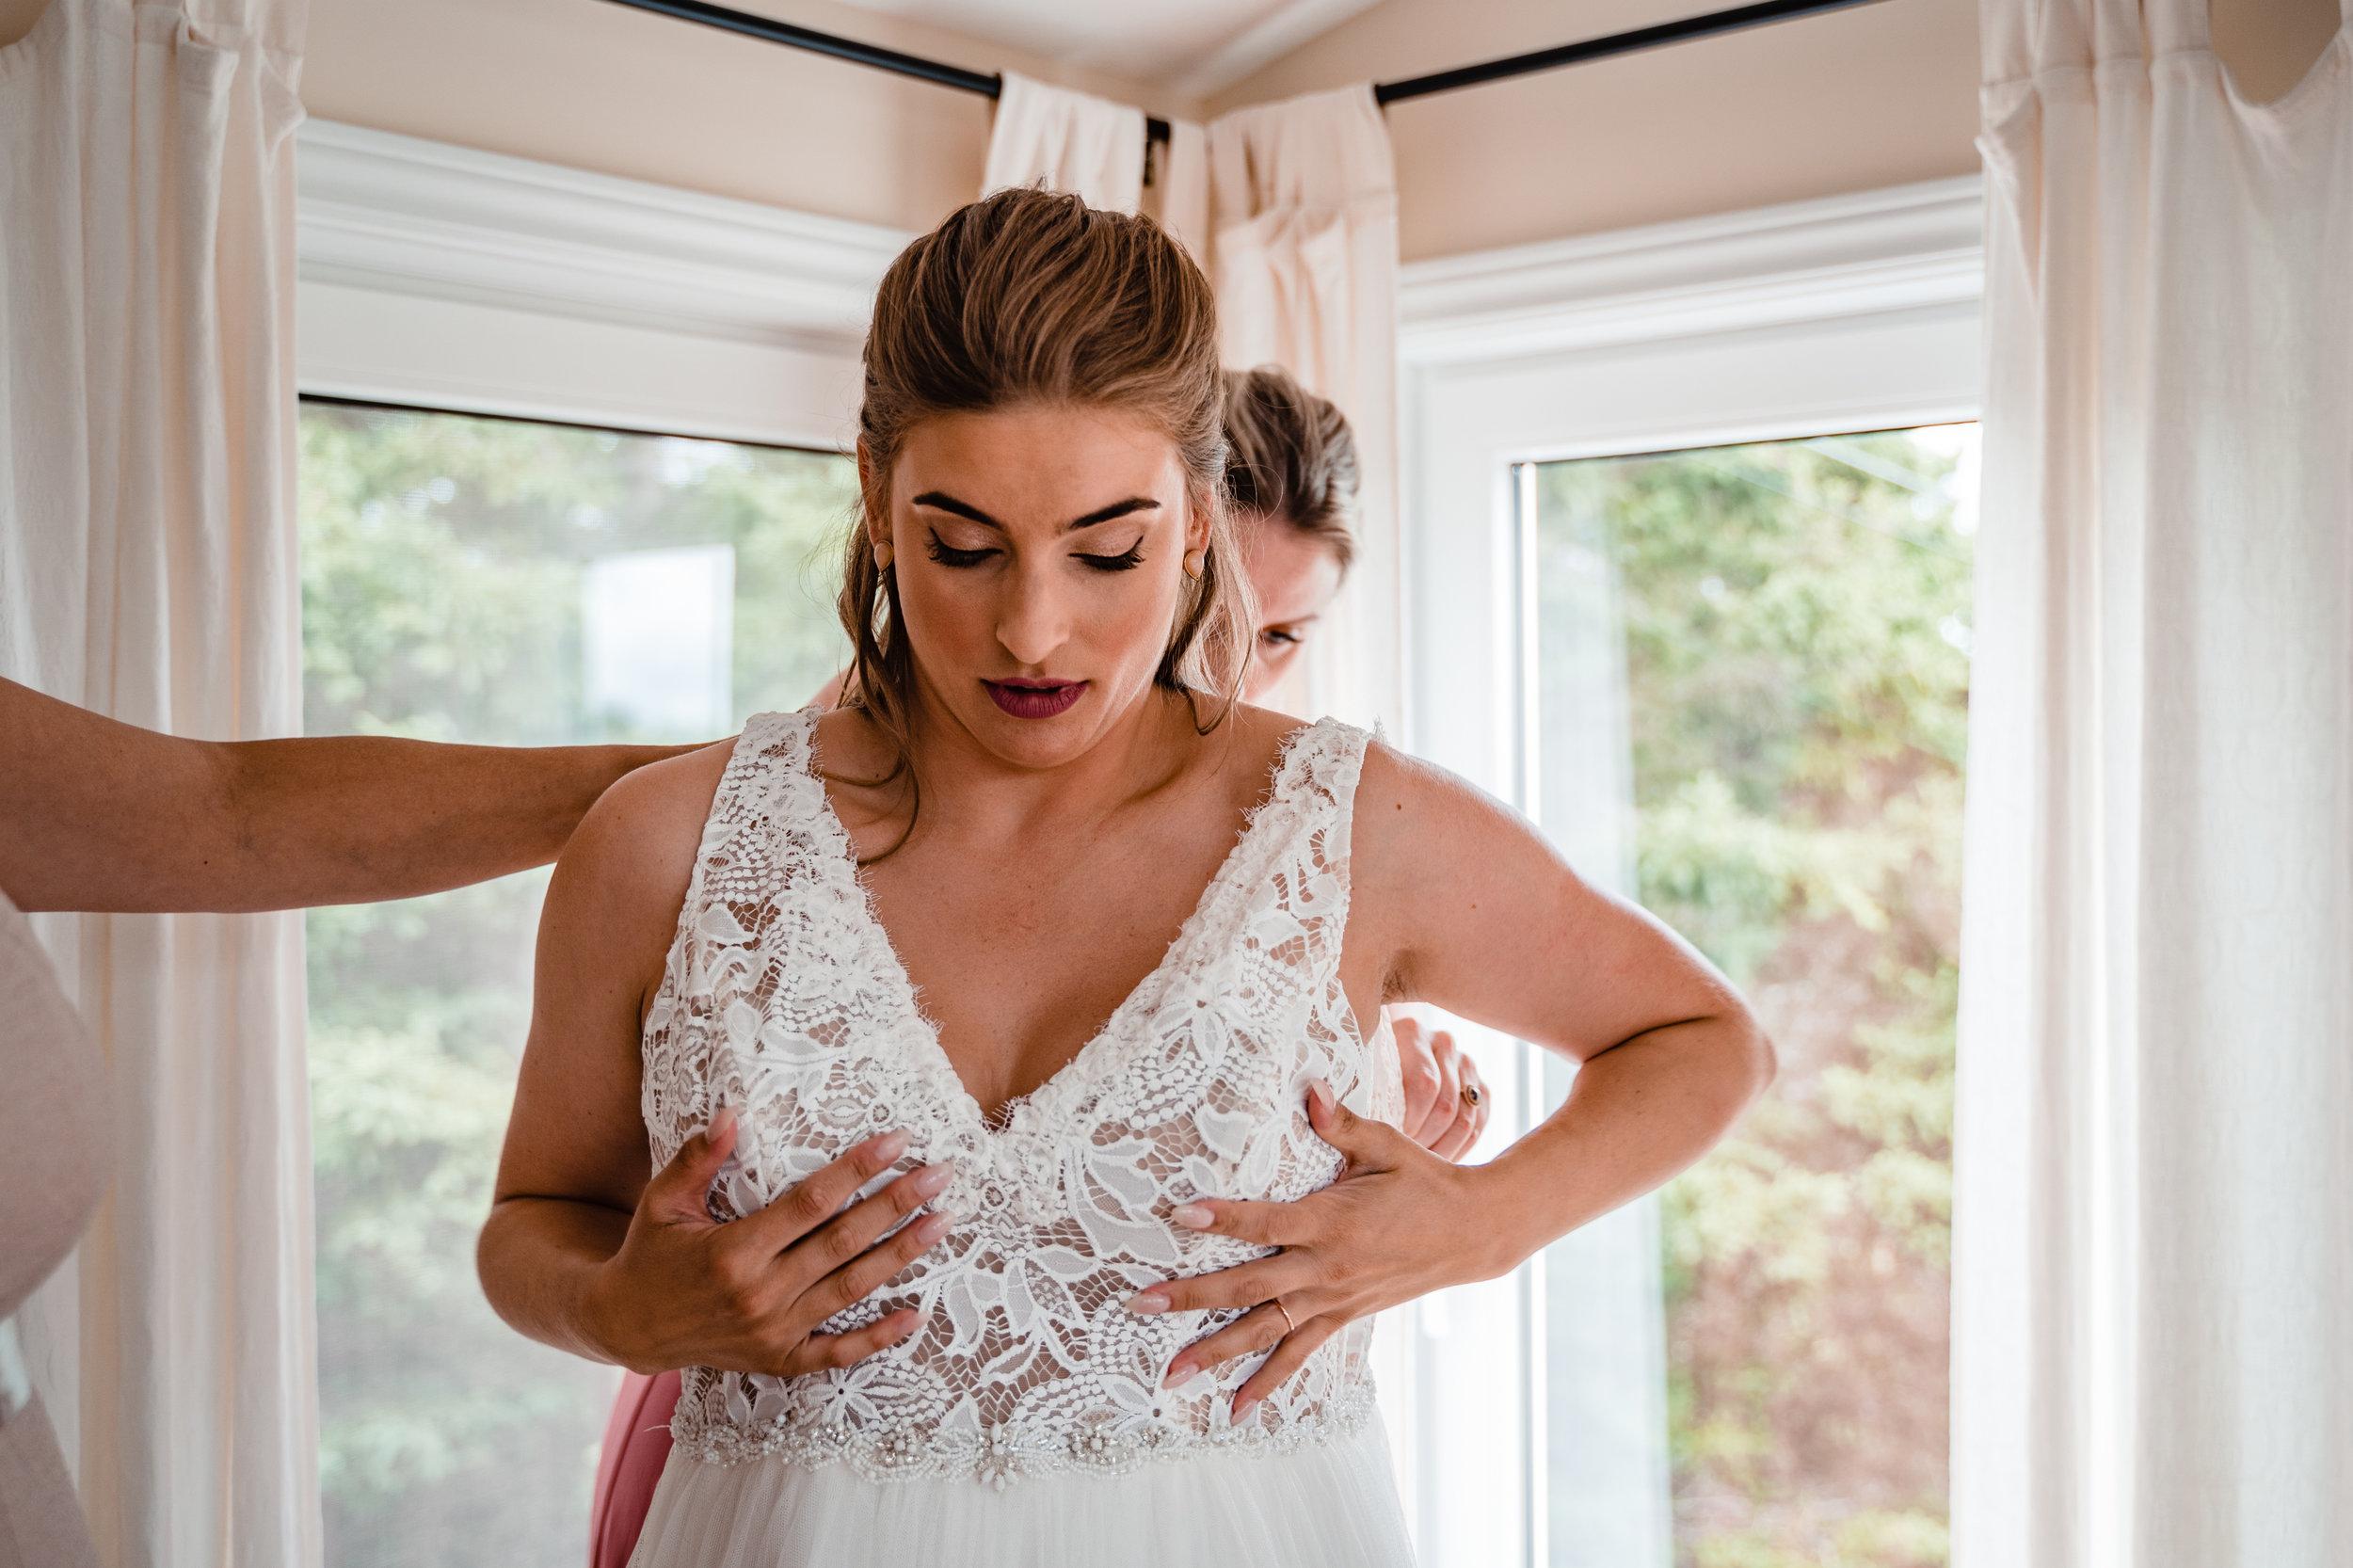 Janelle-Mitch-Halifax-Wedding-Nova-Scotia-Photography (17 of 163).jpg